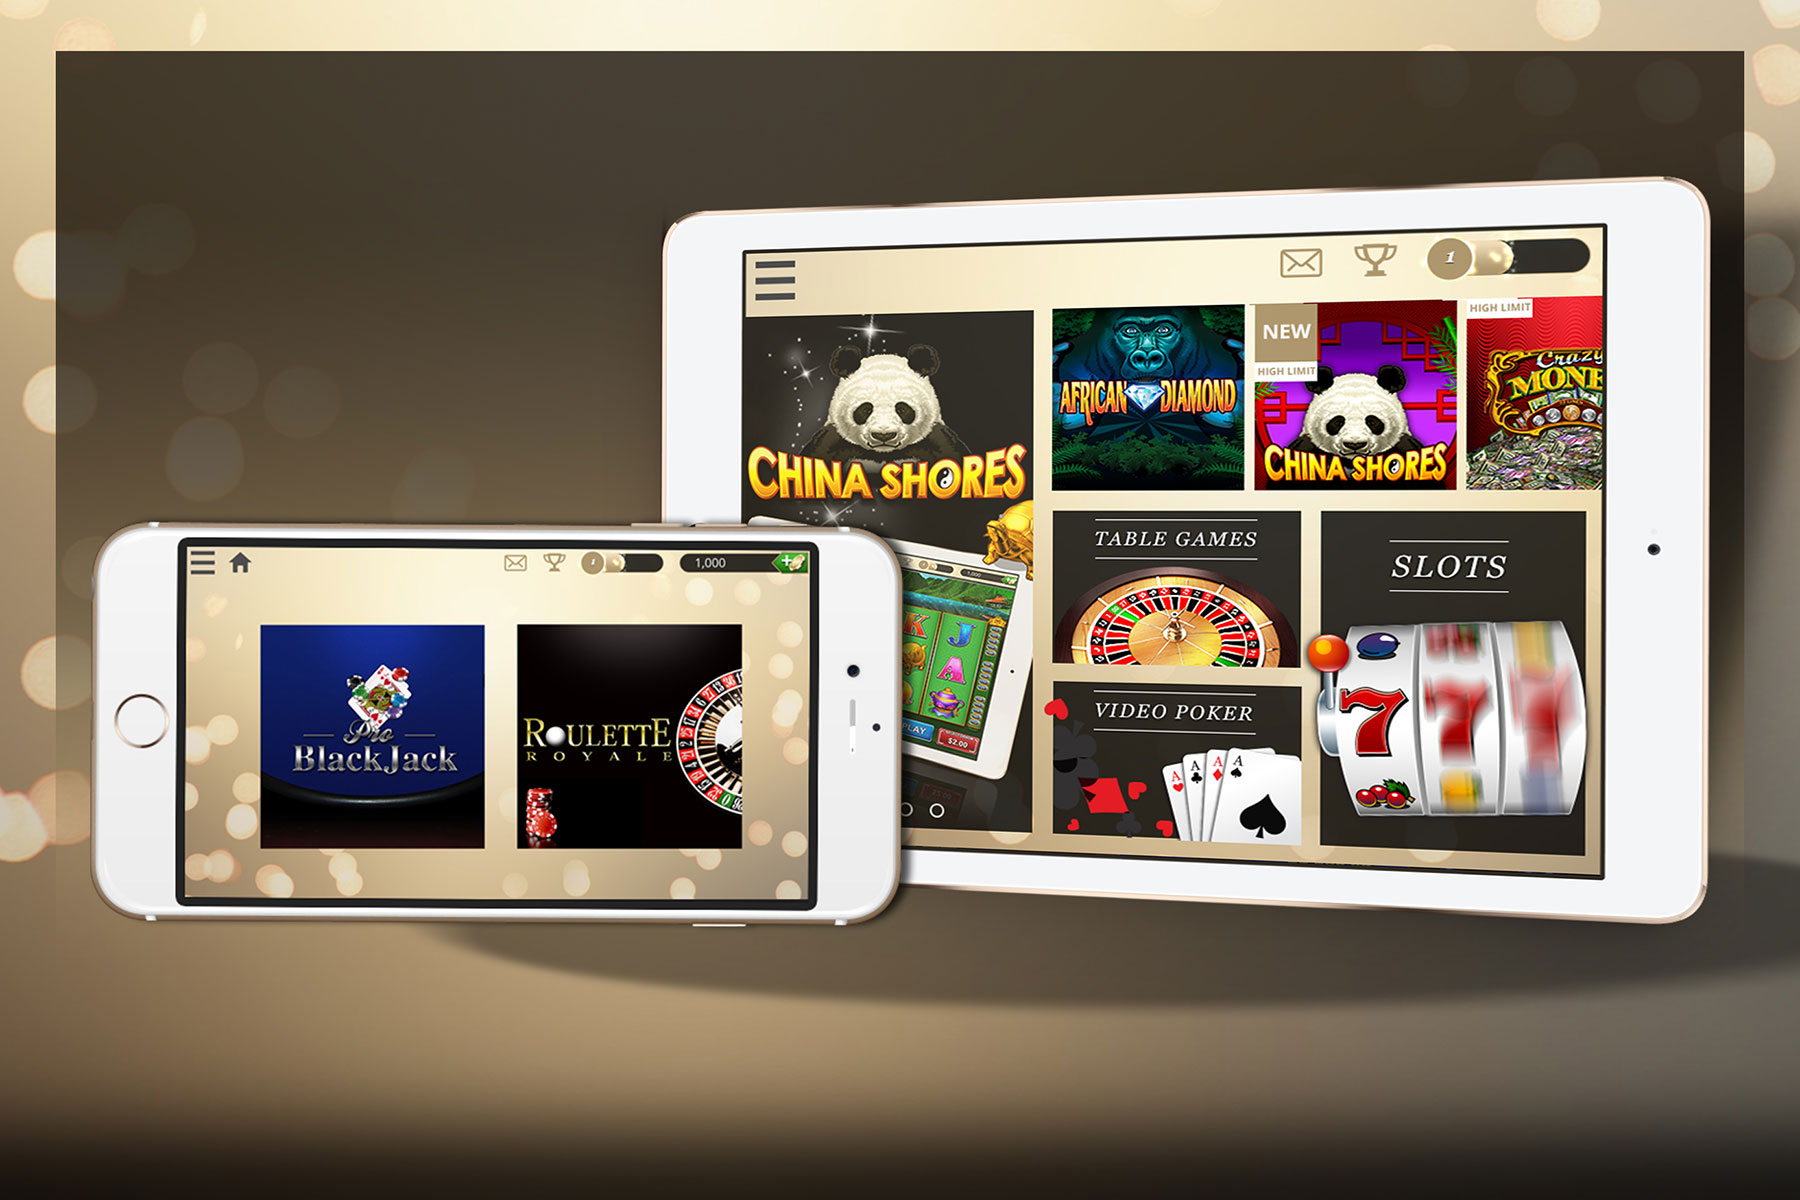 Press | Turning Stone Resort Casino Regarding Bingo Schedule For Turning Stone For Today